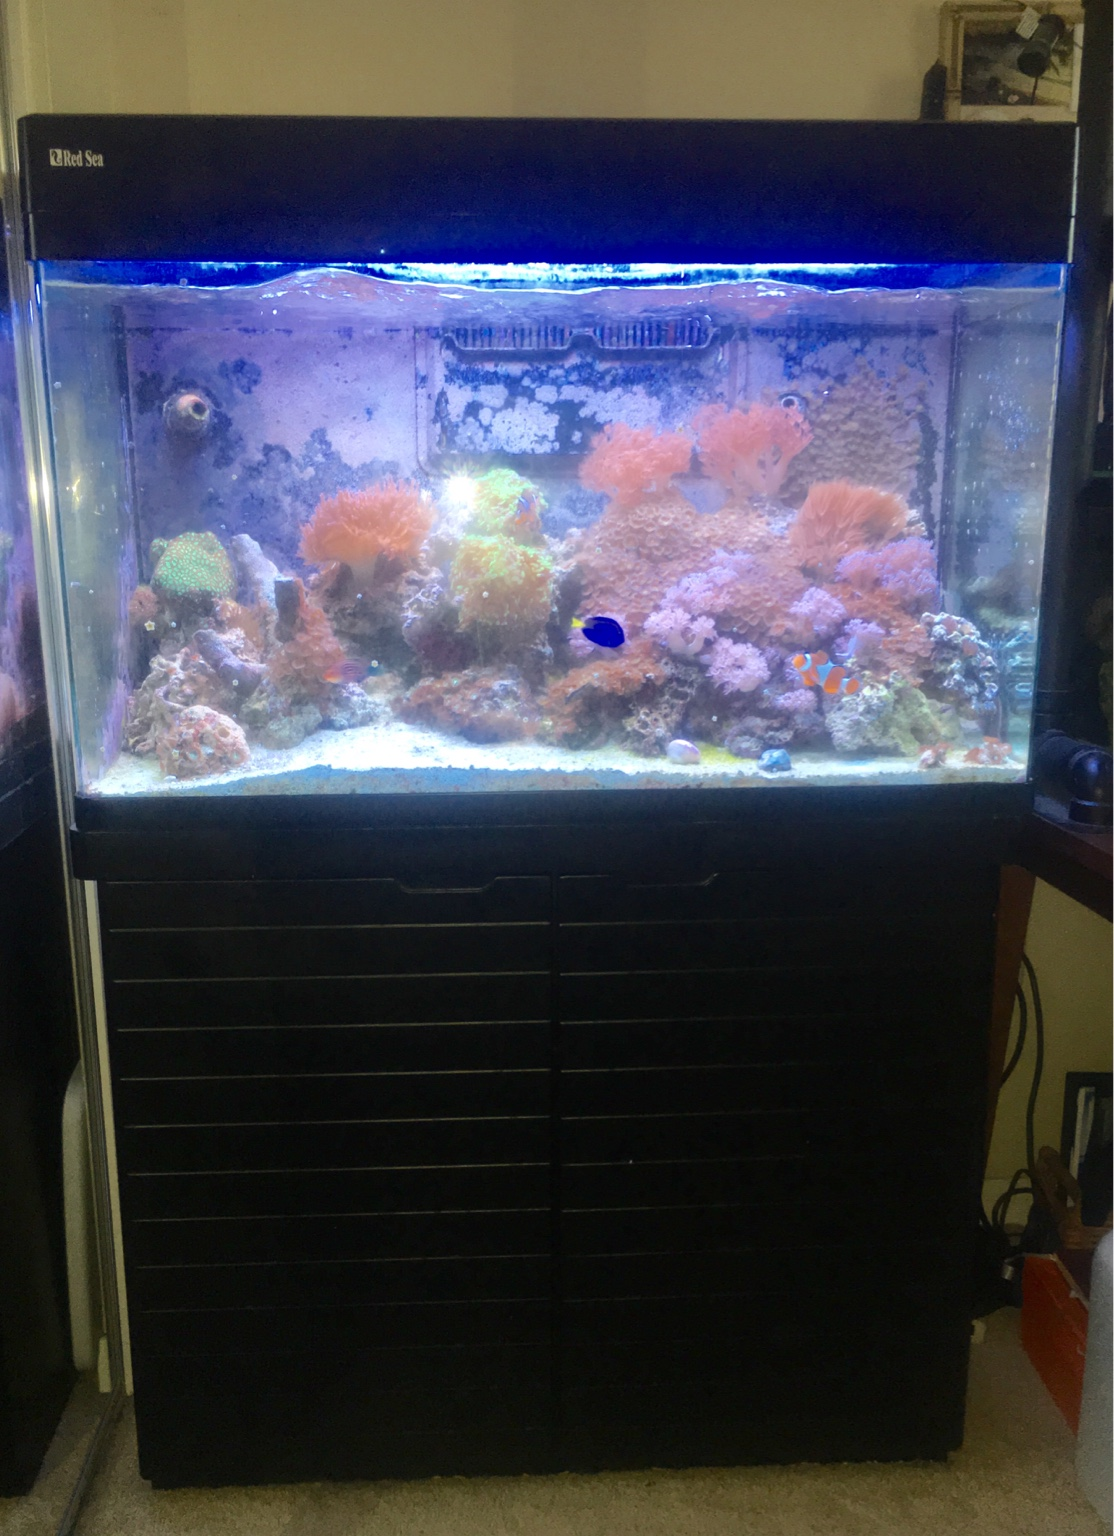 faunaclassifieds view single post for sale aquarium 65. Black Bedroom Furniture Sets. Home Design Ideas